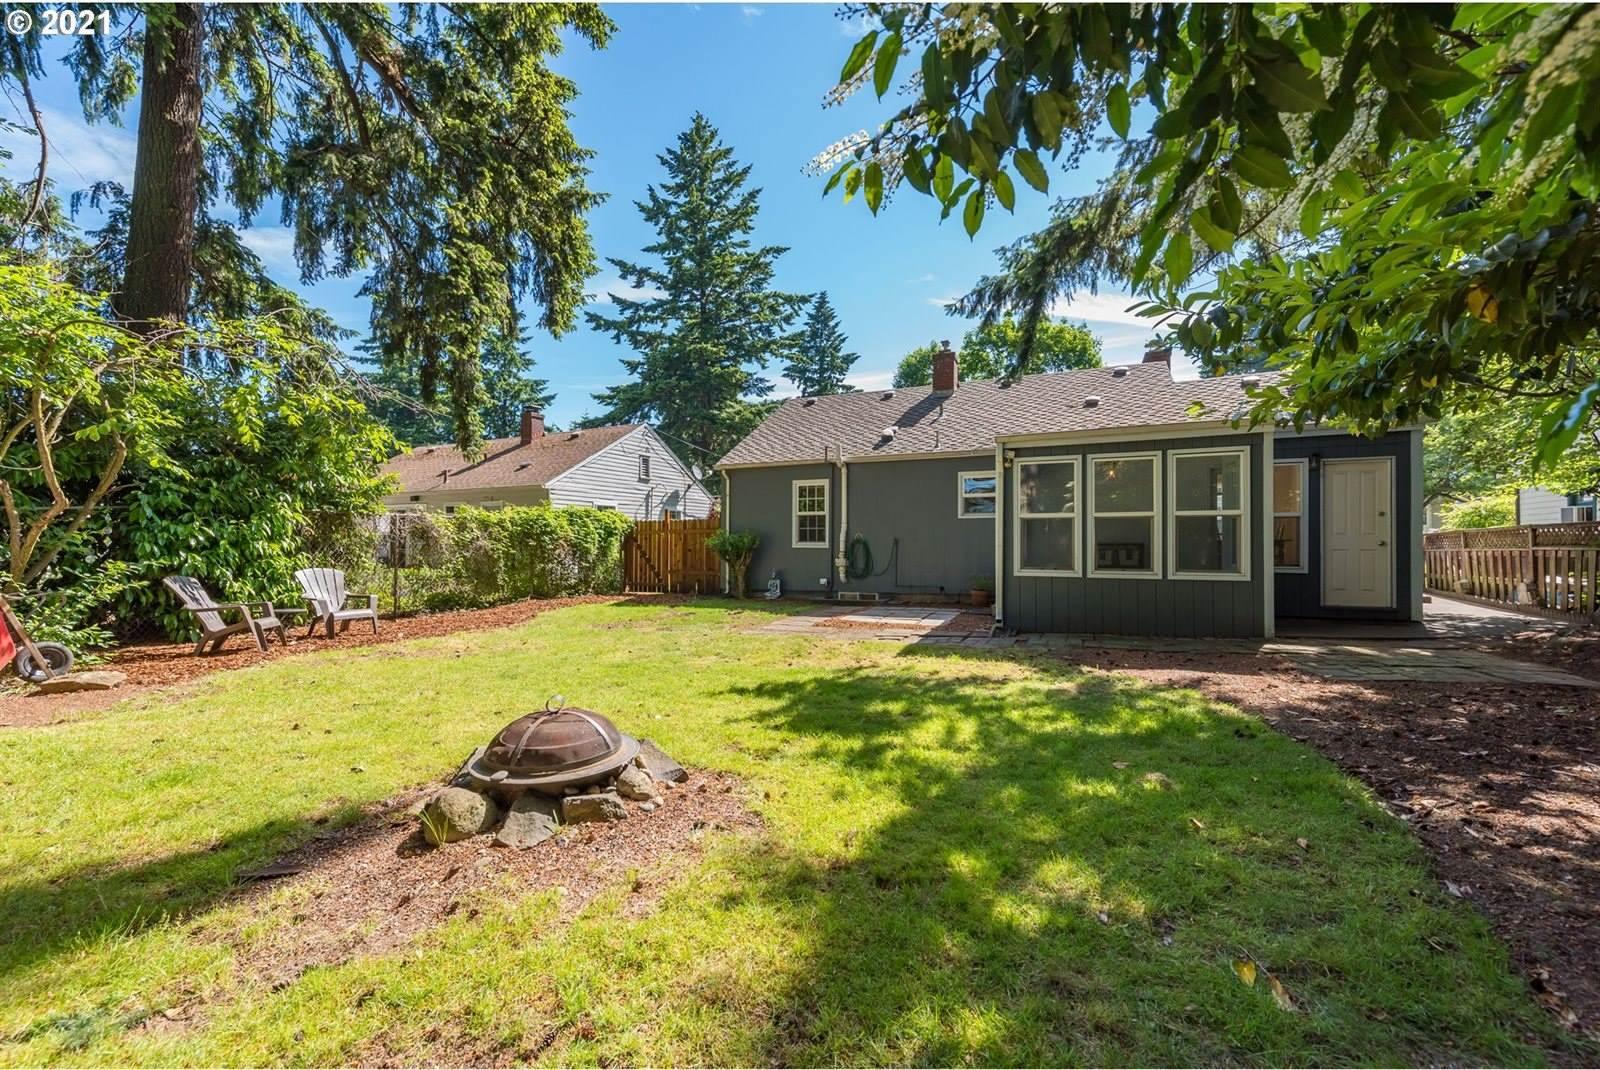 1703 NE 101ST Ave, Portland, OR 97220